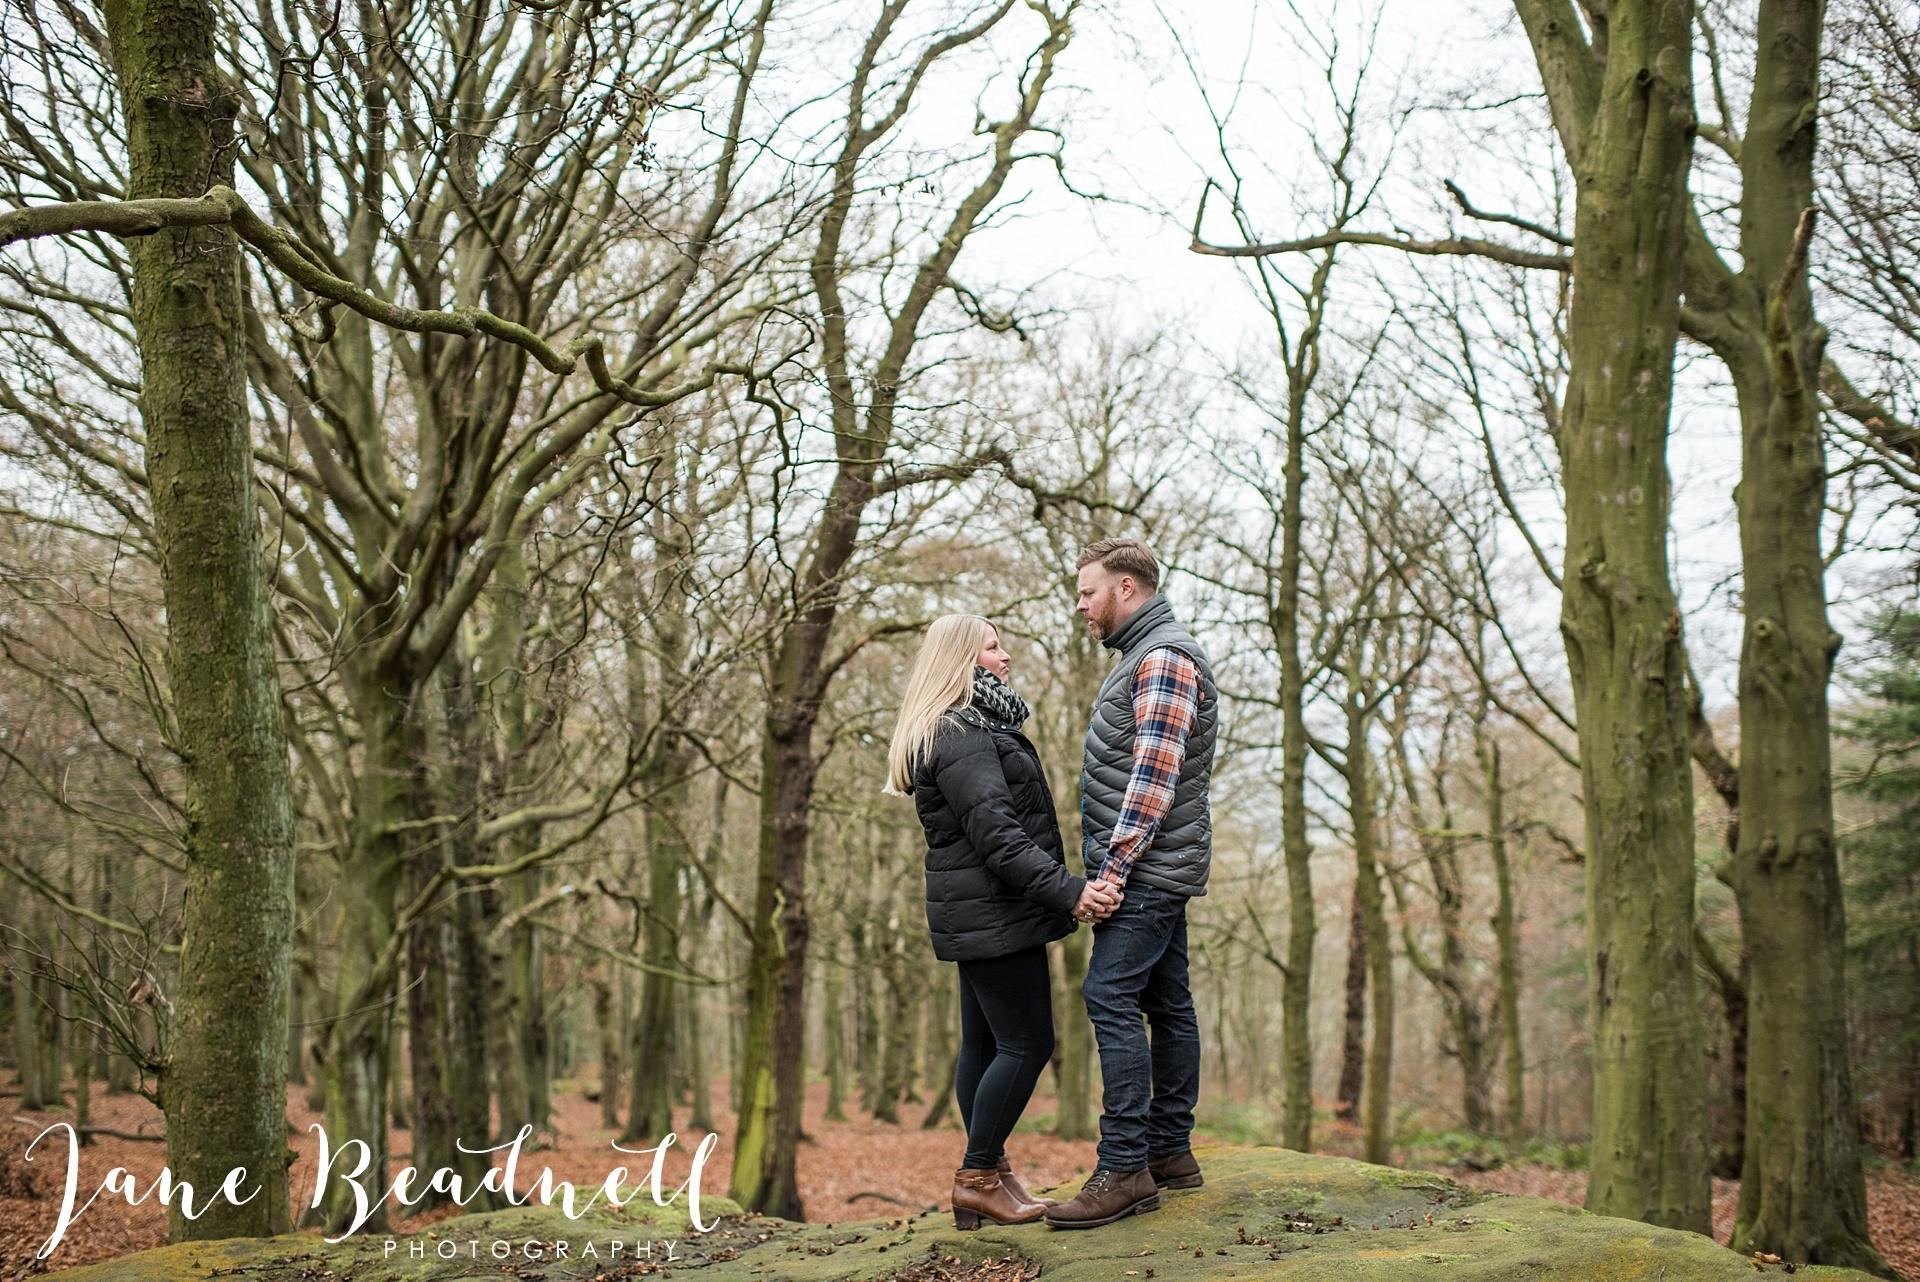 yorkshire-wedding-photographer-jane-beadnell-photography-uk-and-destination-wedding-photographer-engagement-shoot_0027